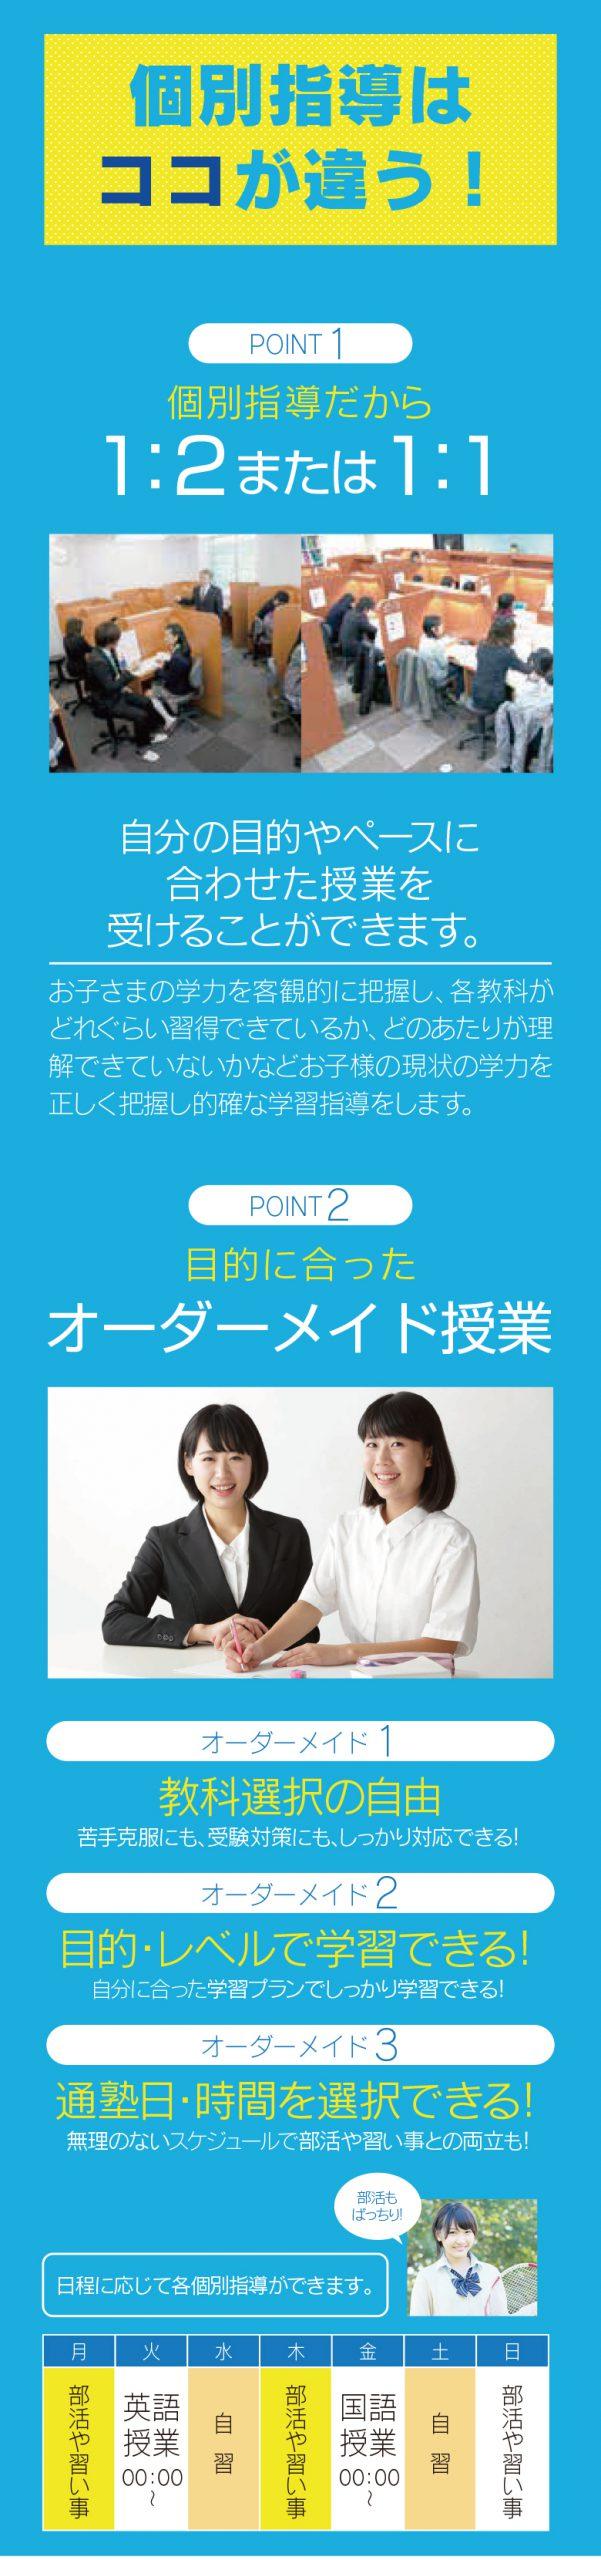 kds-case-21n-point-01